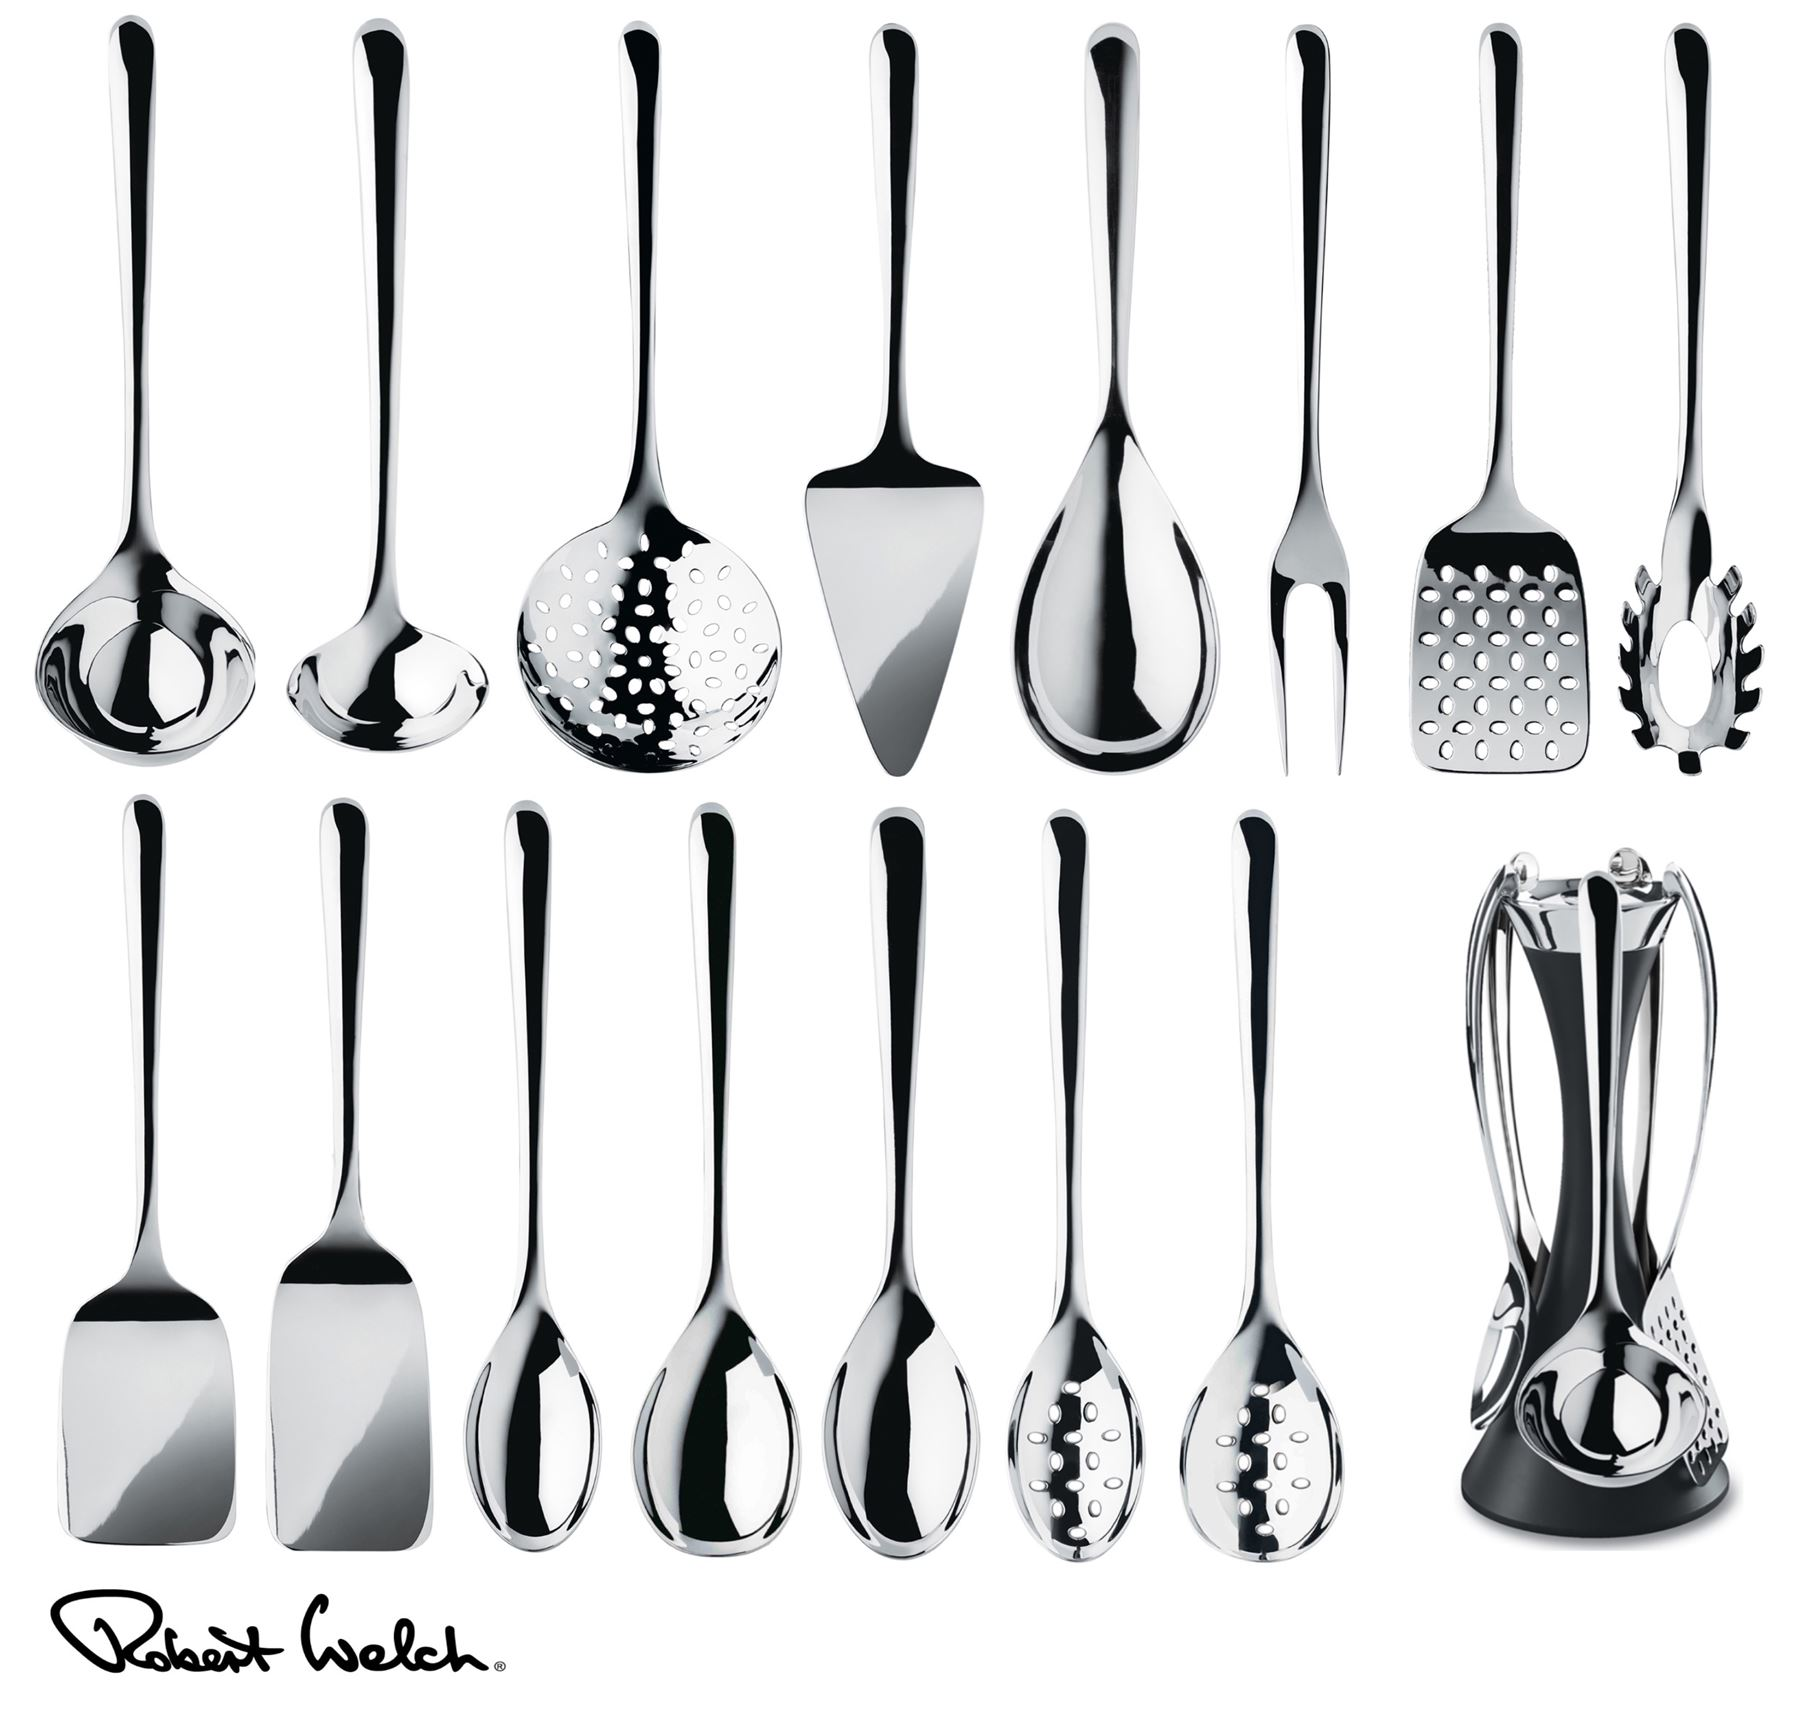 kitchen utensils set garden window robert welch signature spoon turner or server etc